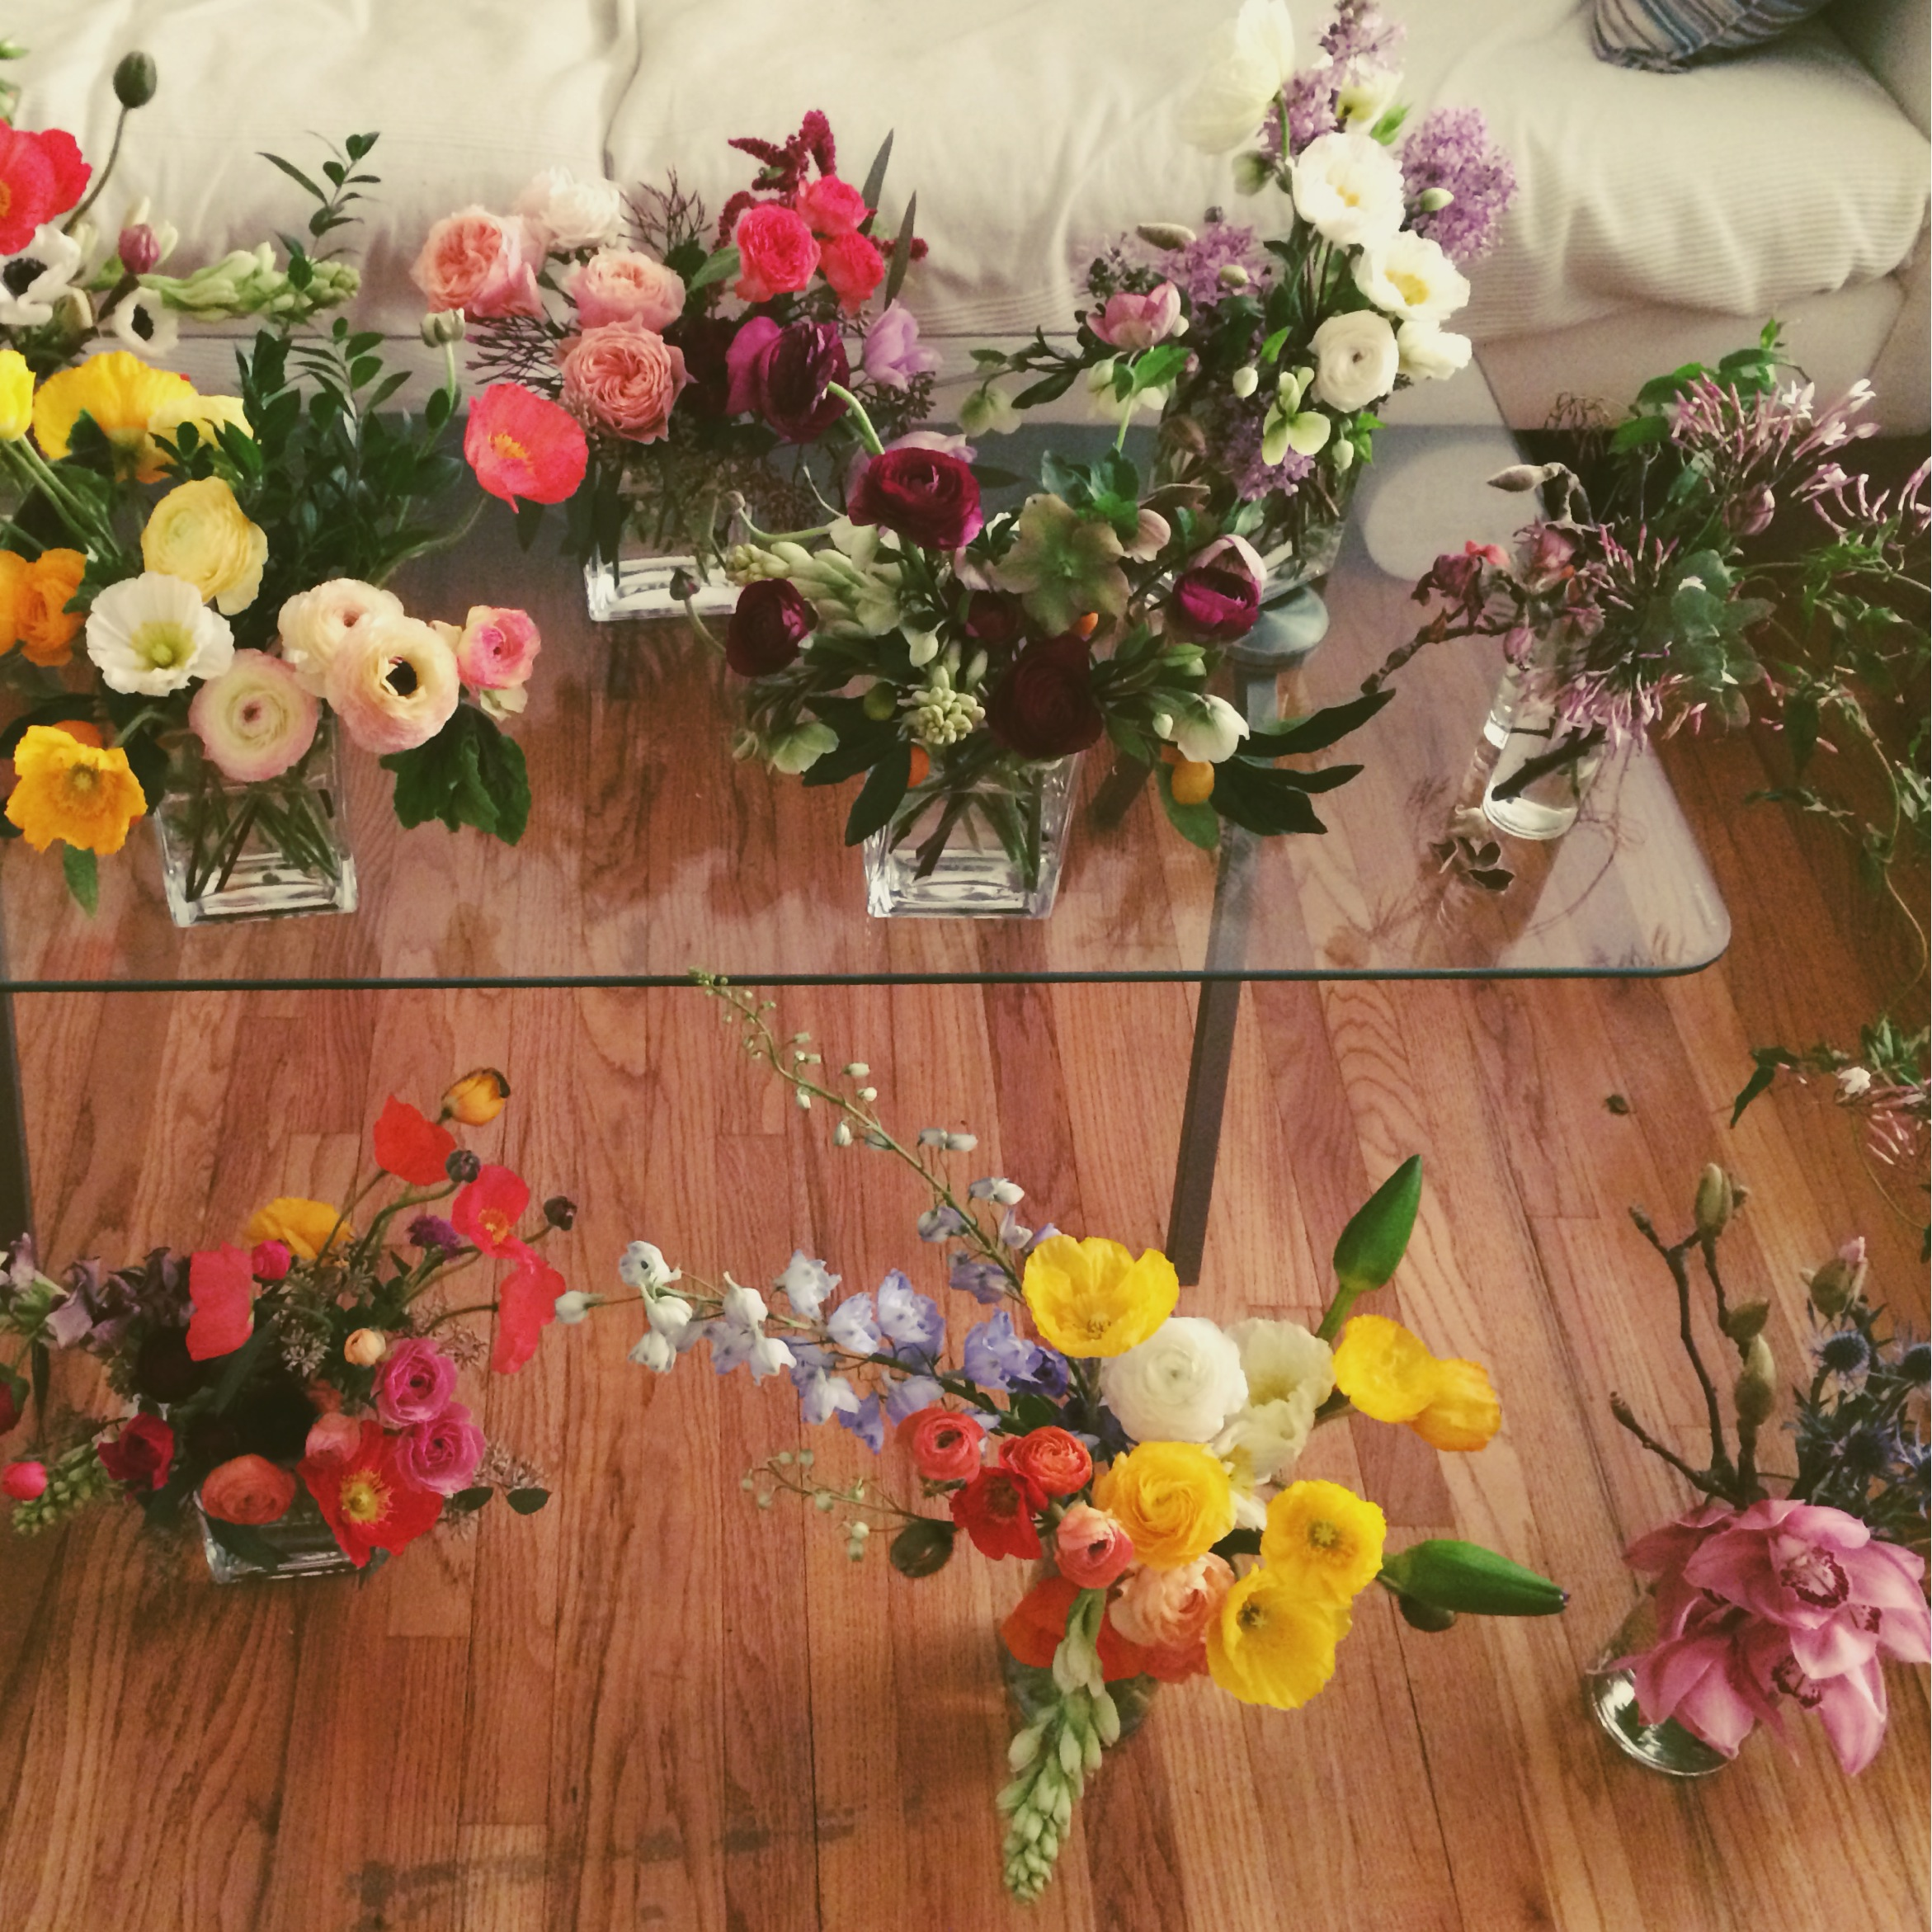 #gettingready #morningof #flowersflowersflowers